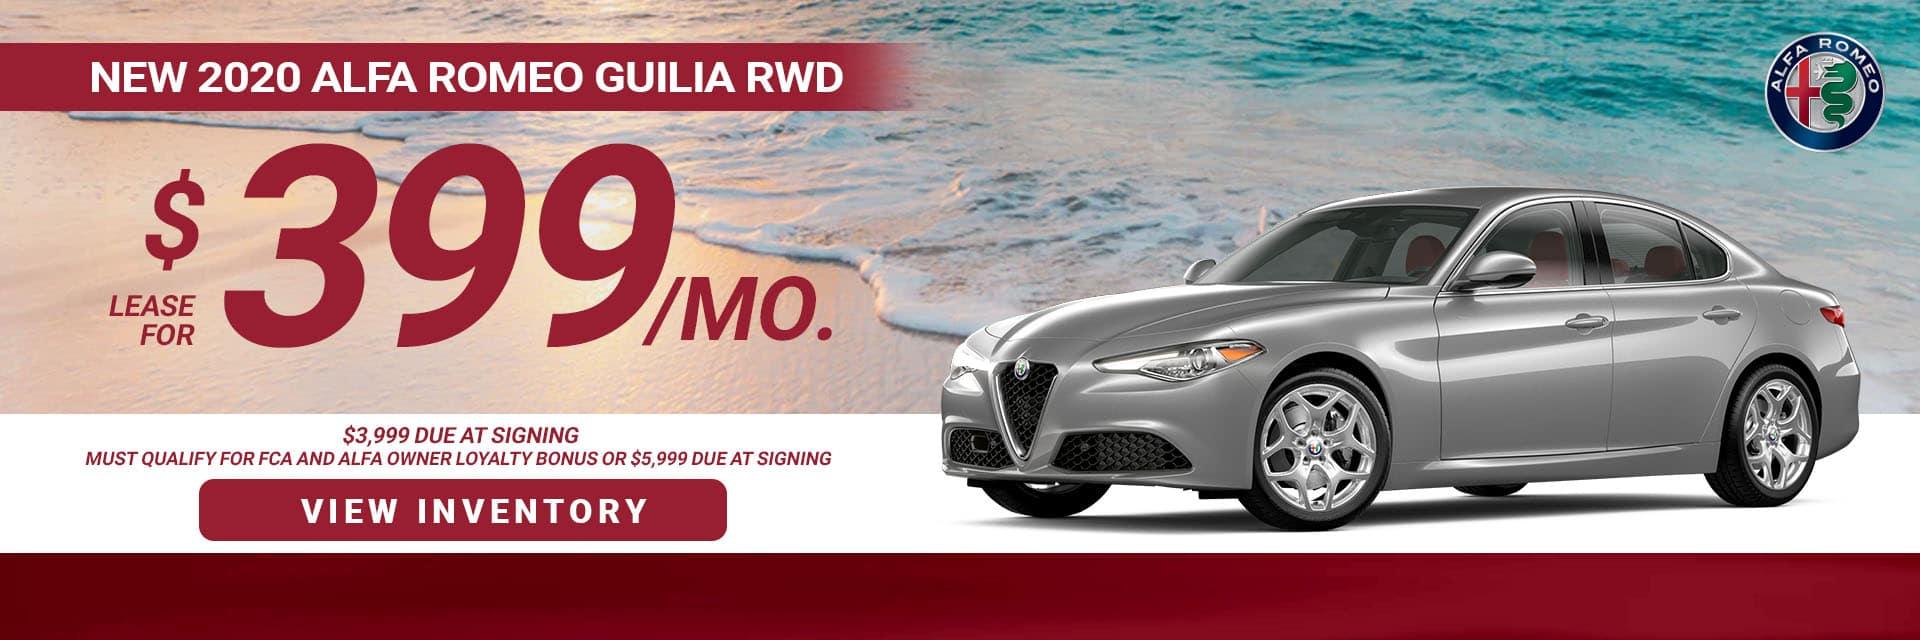 SLAR-July 20212021 Alfa Romeo Giulia copy